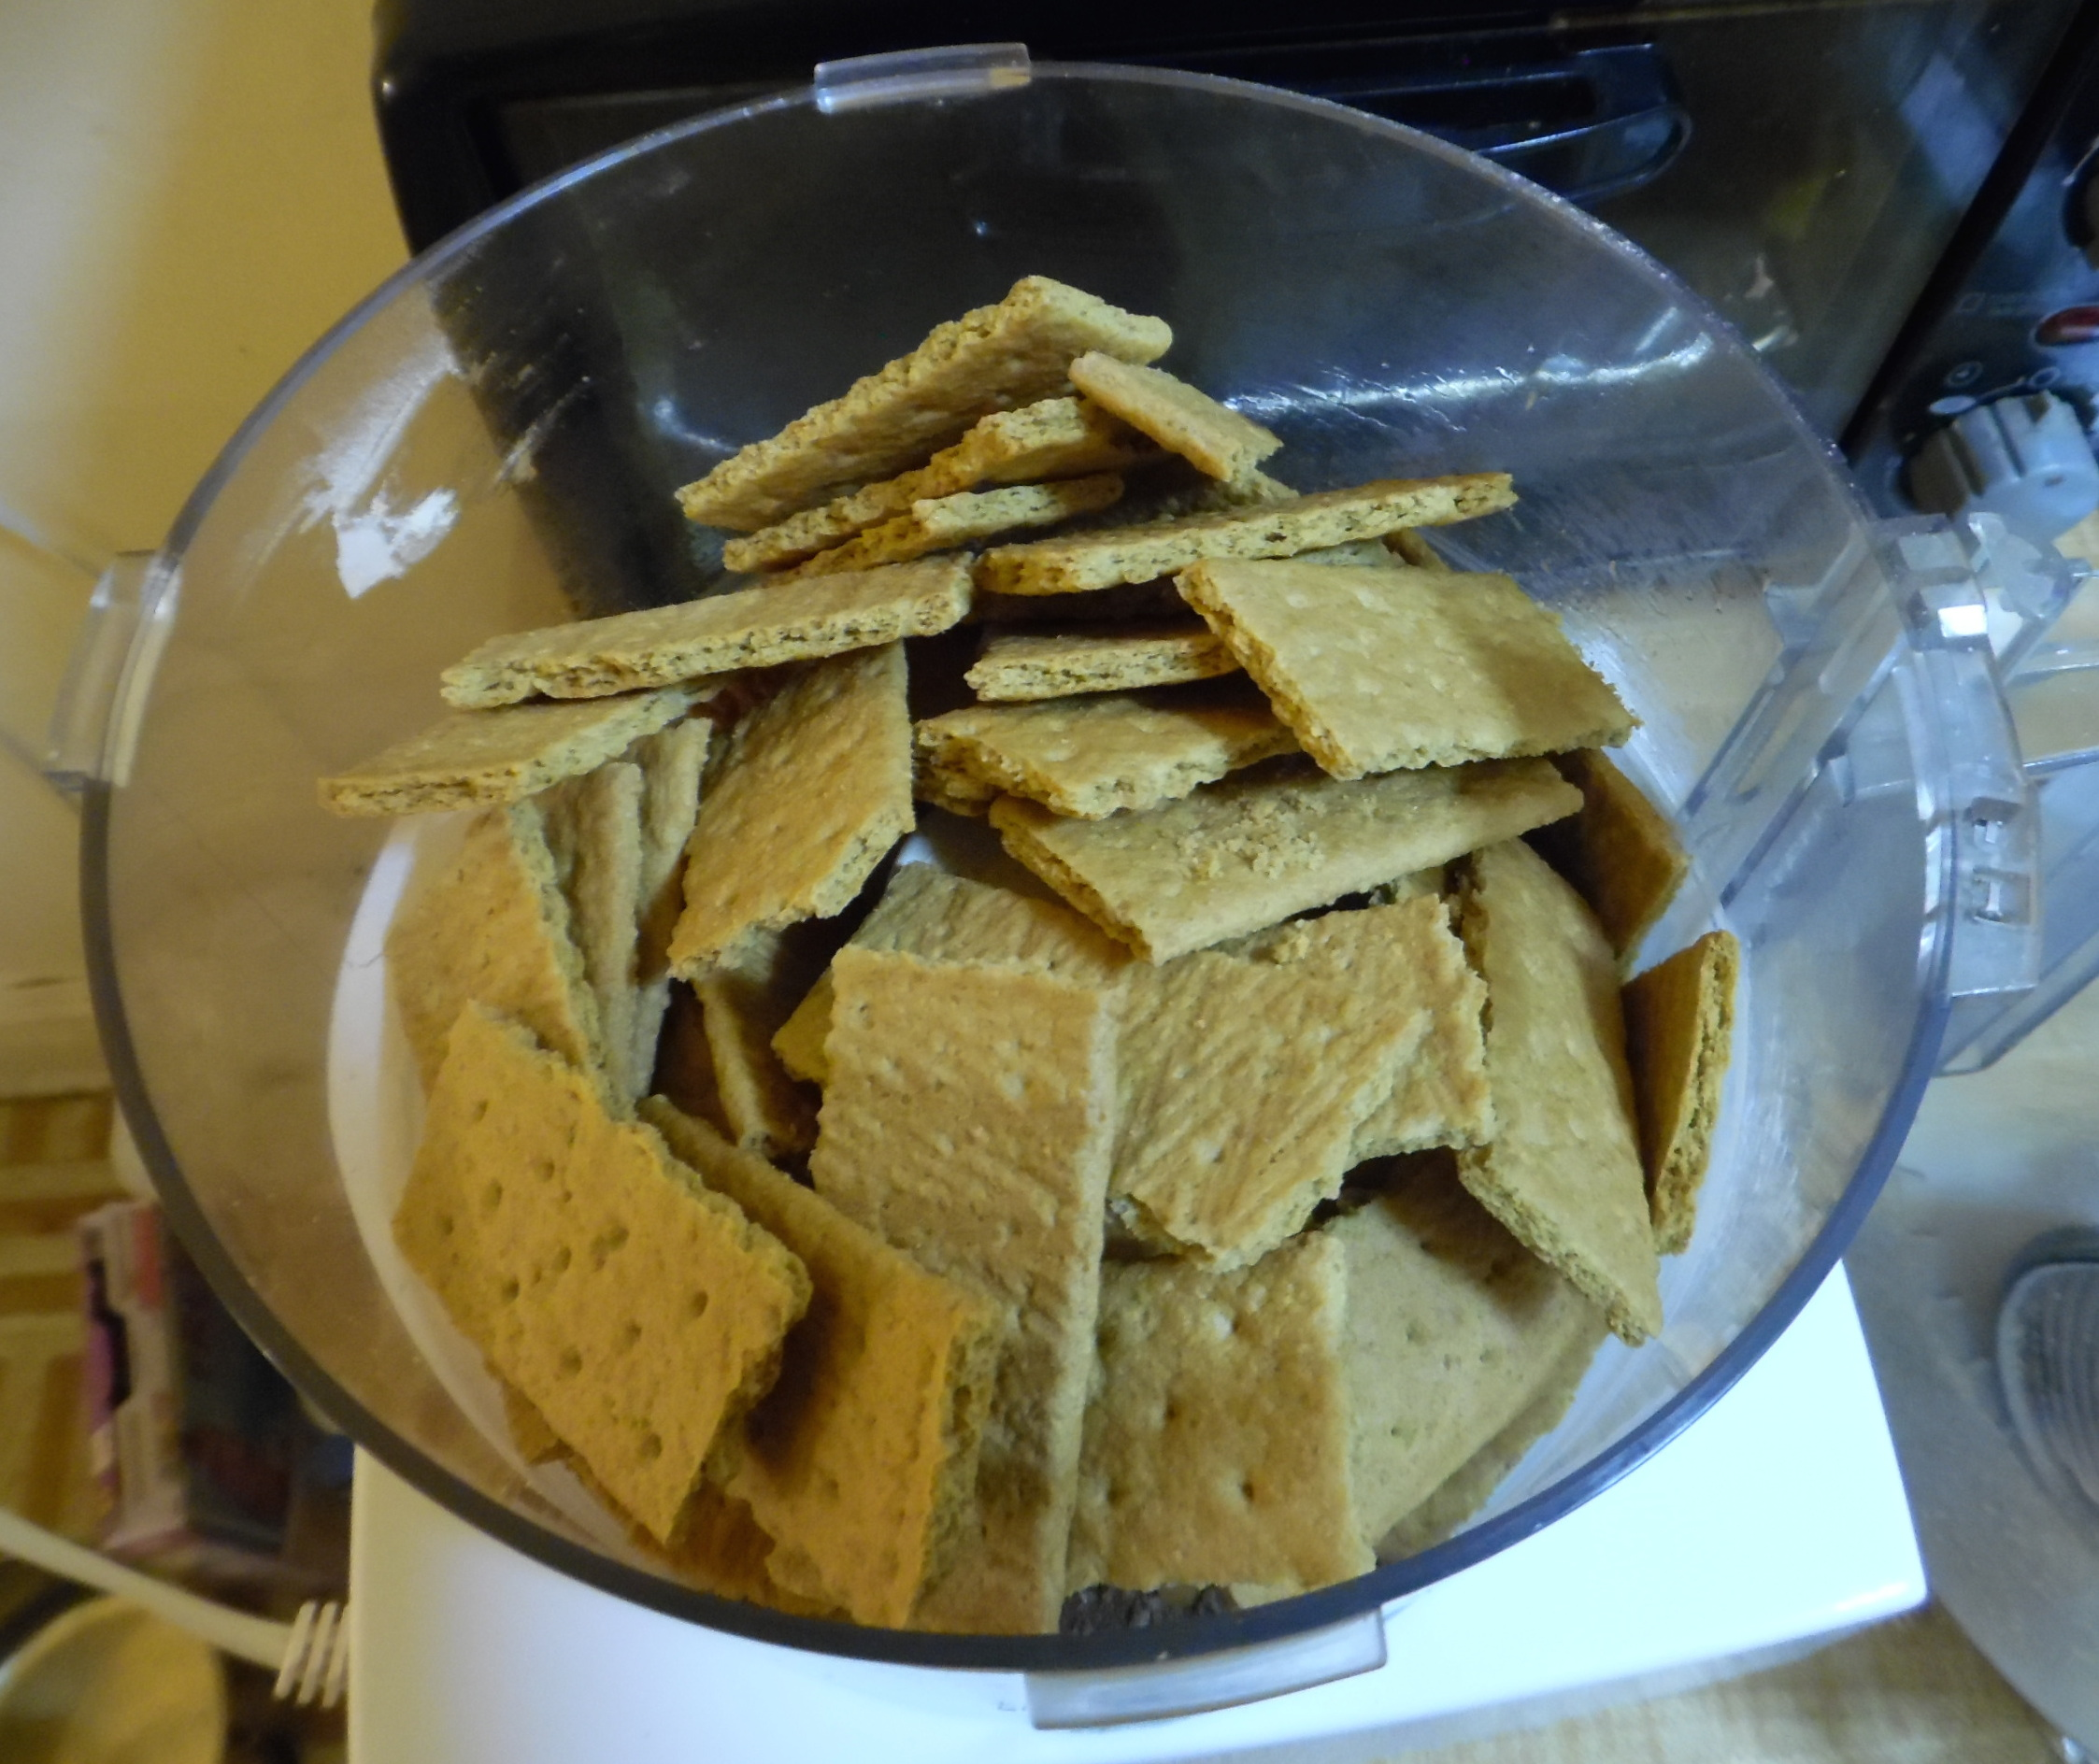 Graham crackers in food processor.